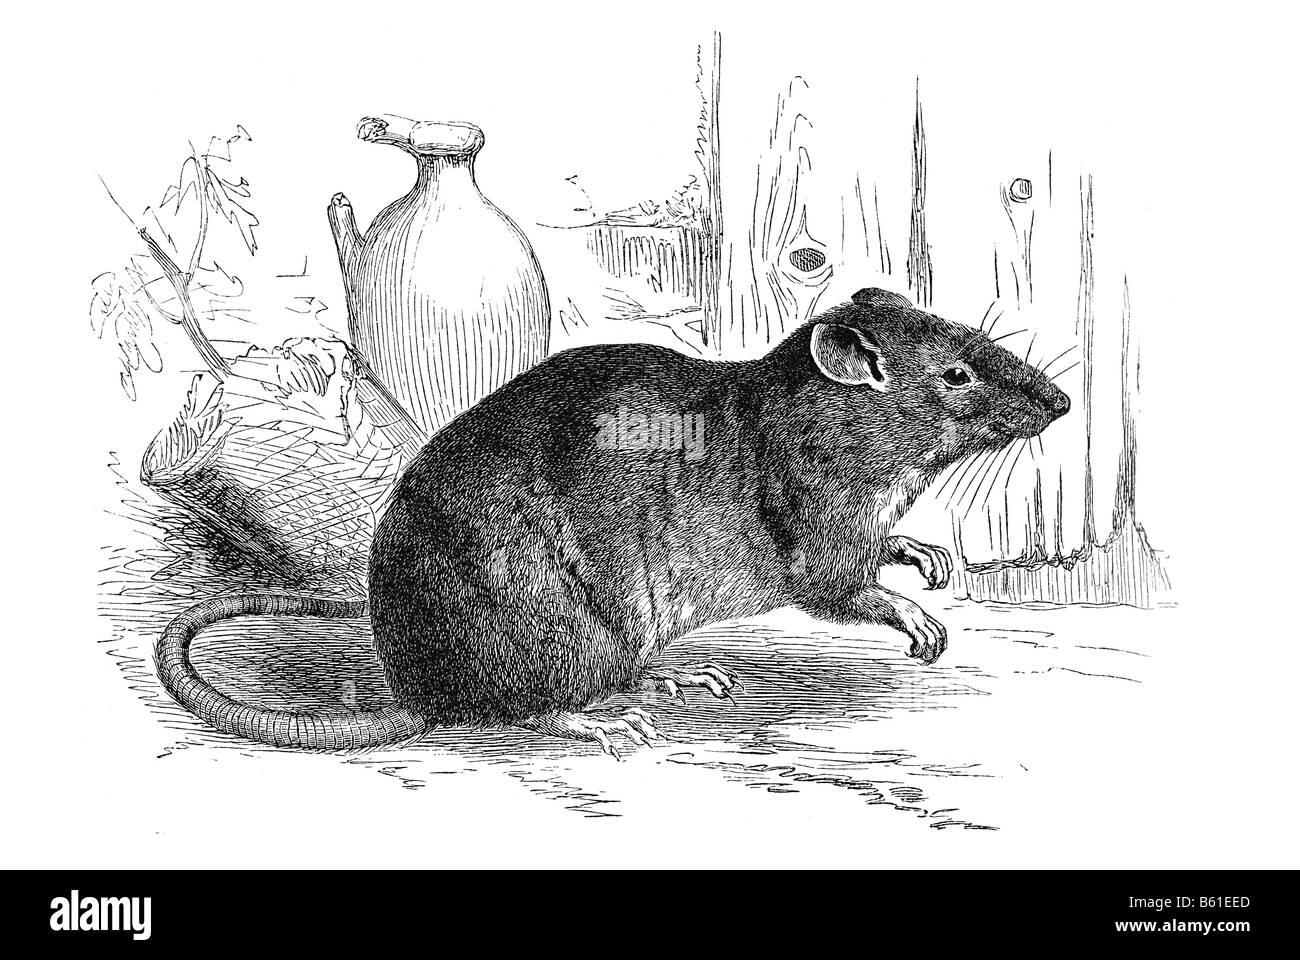 brown rat, common rat, Hanover rat, Norway rat, Norwegian rat, or wharf rat Stock Photo